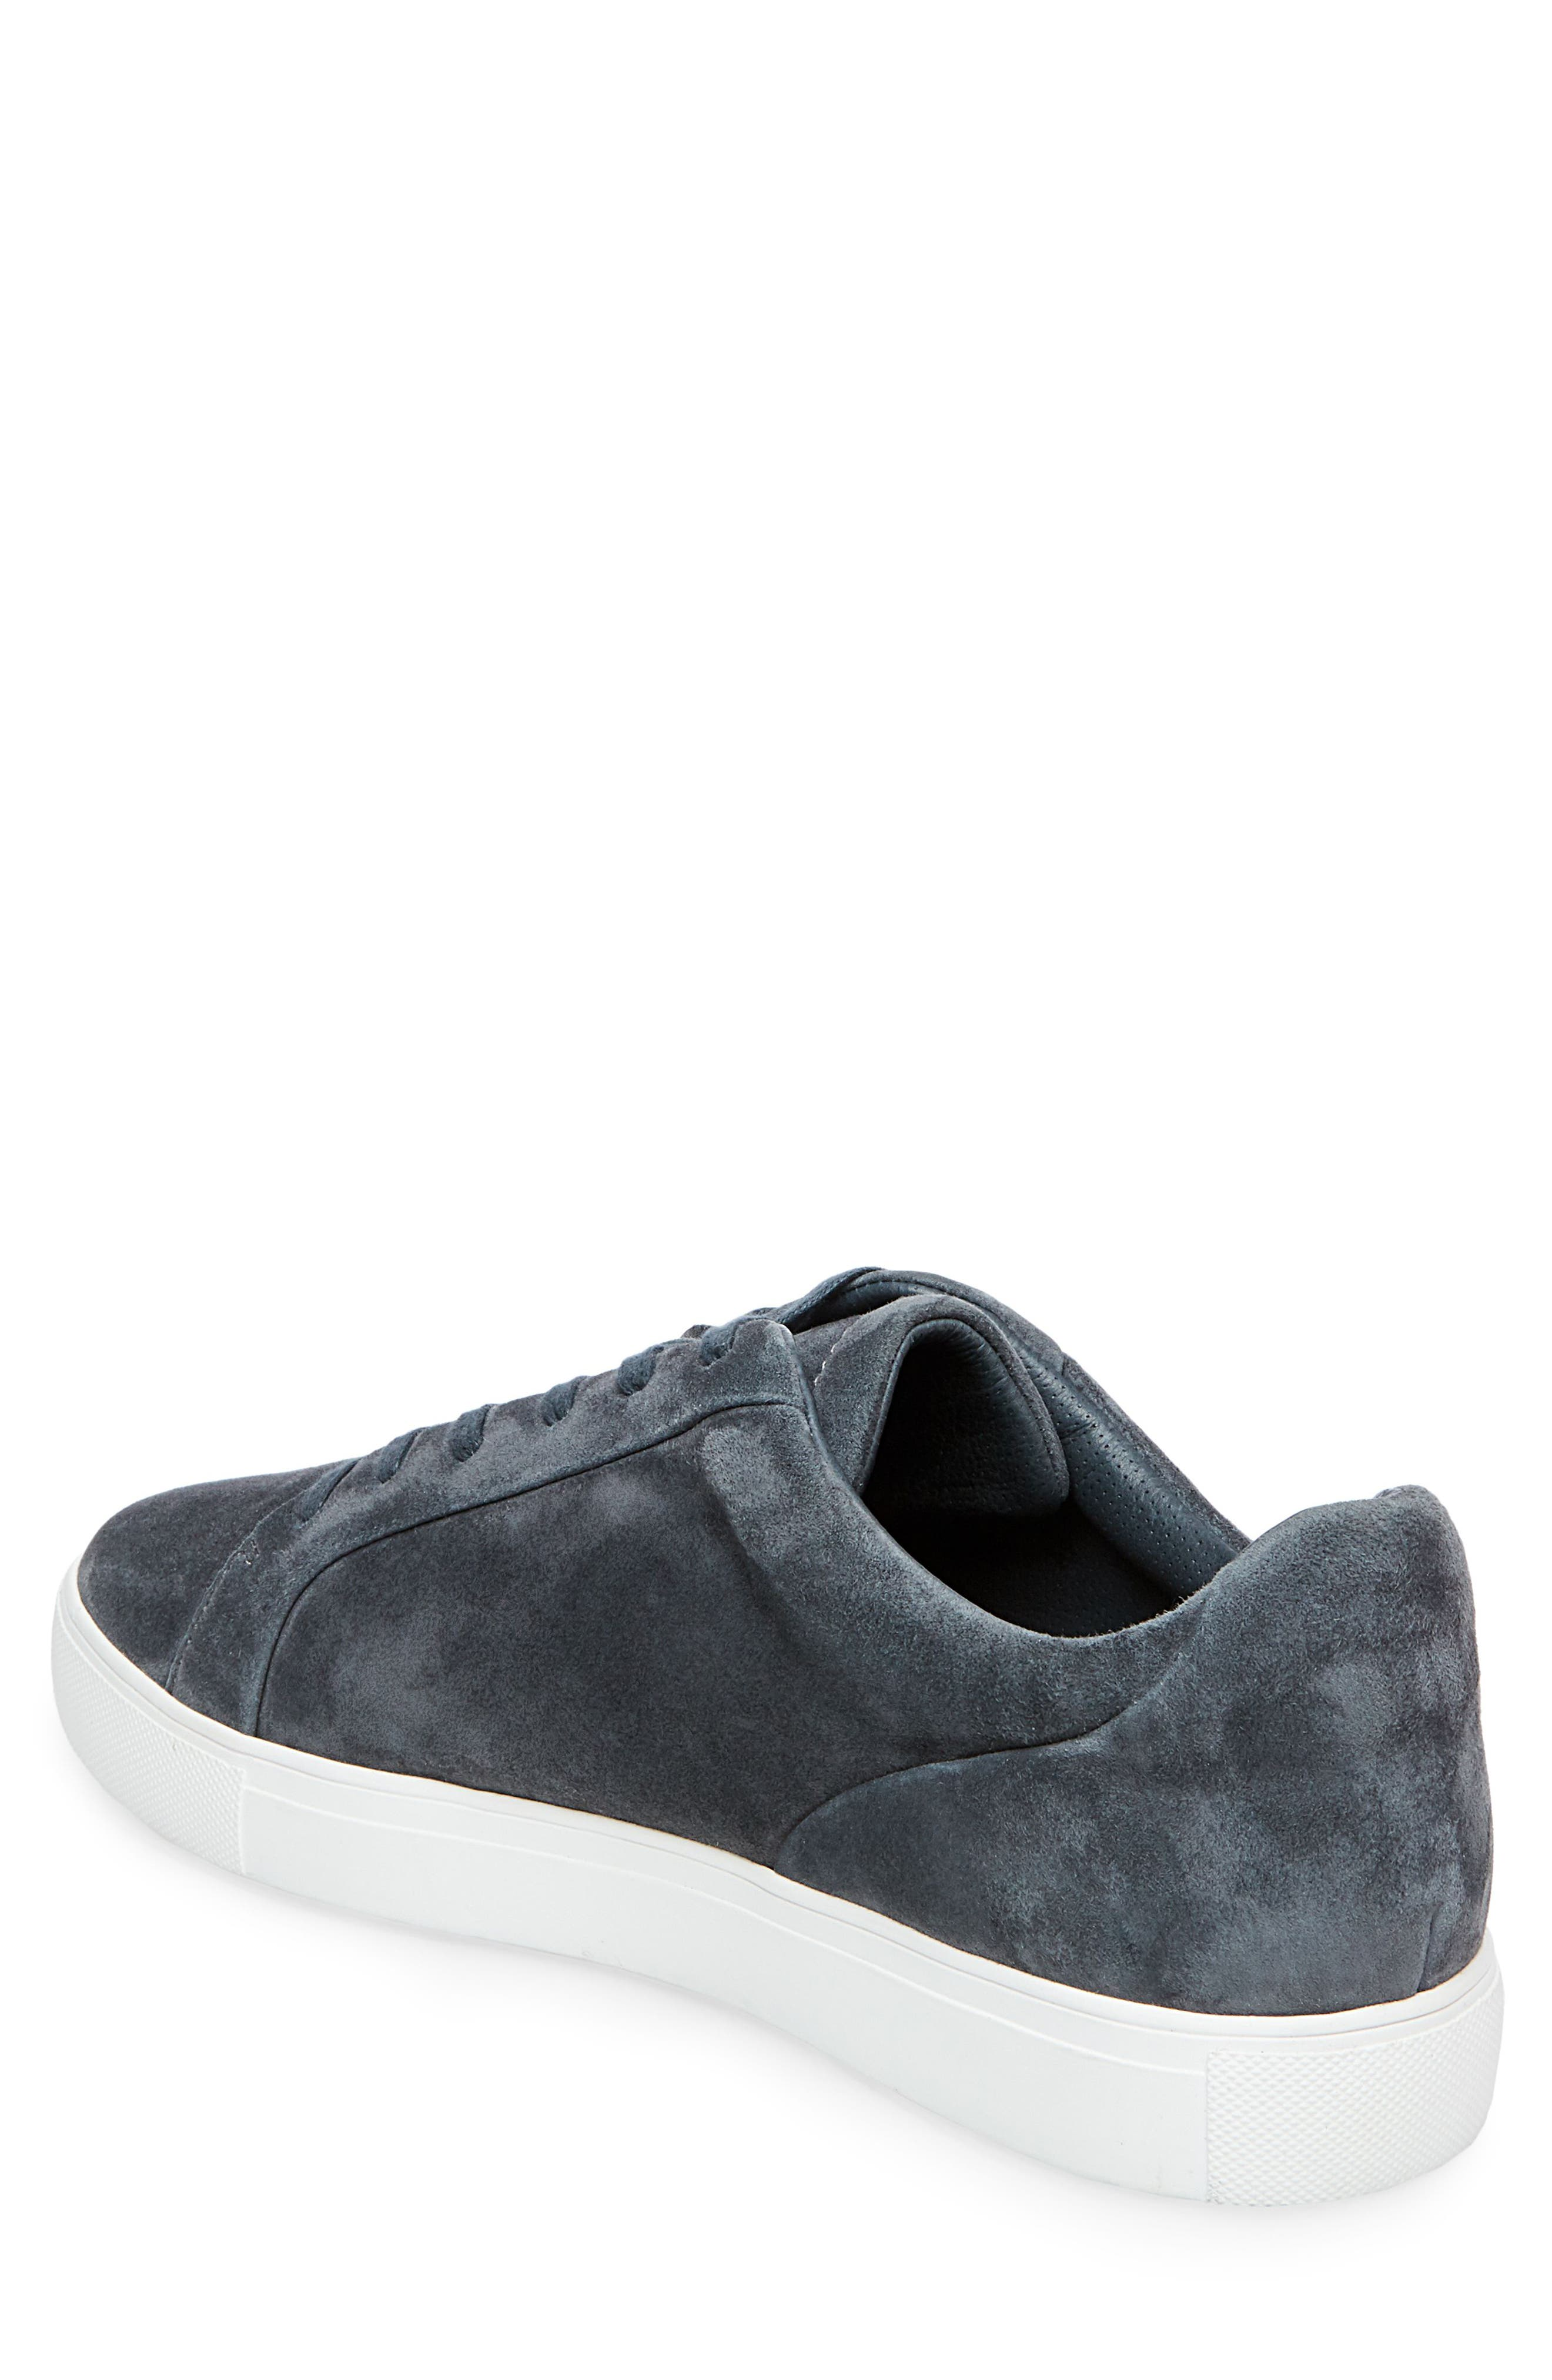 x GQ James Sneaker,                             Alternate thumbnail 2, color,                             020